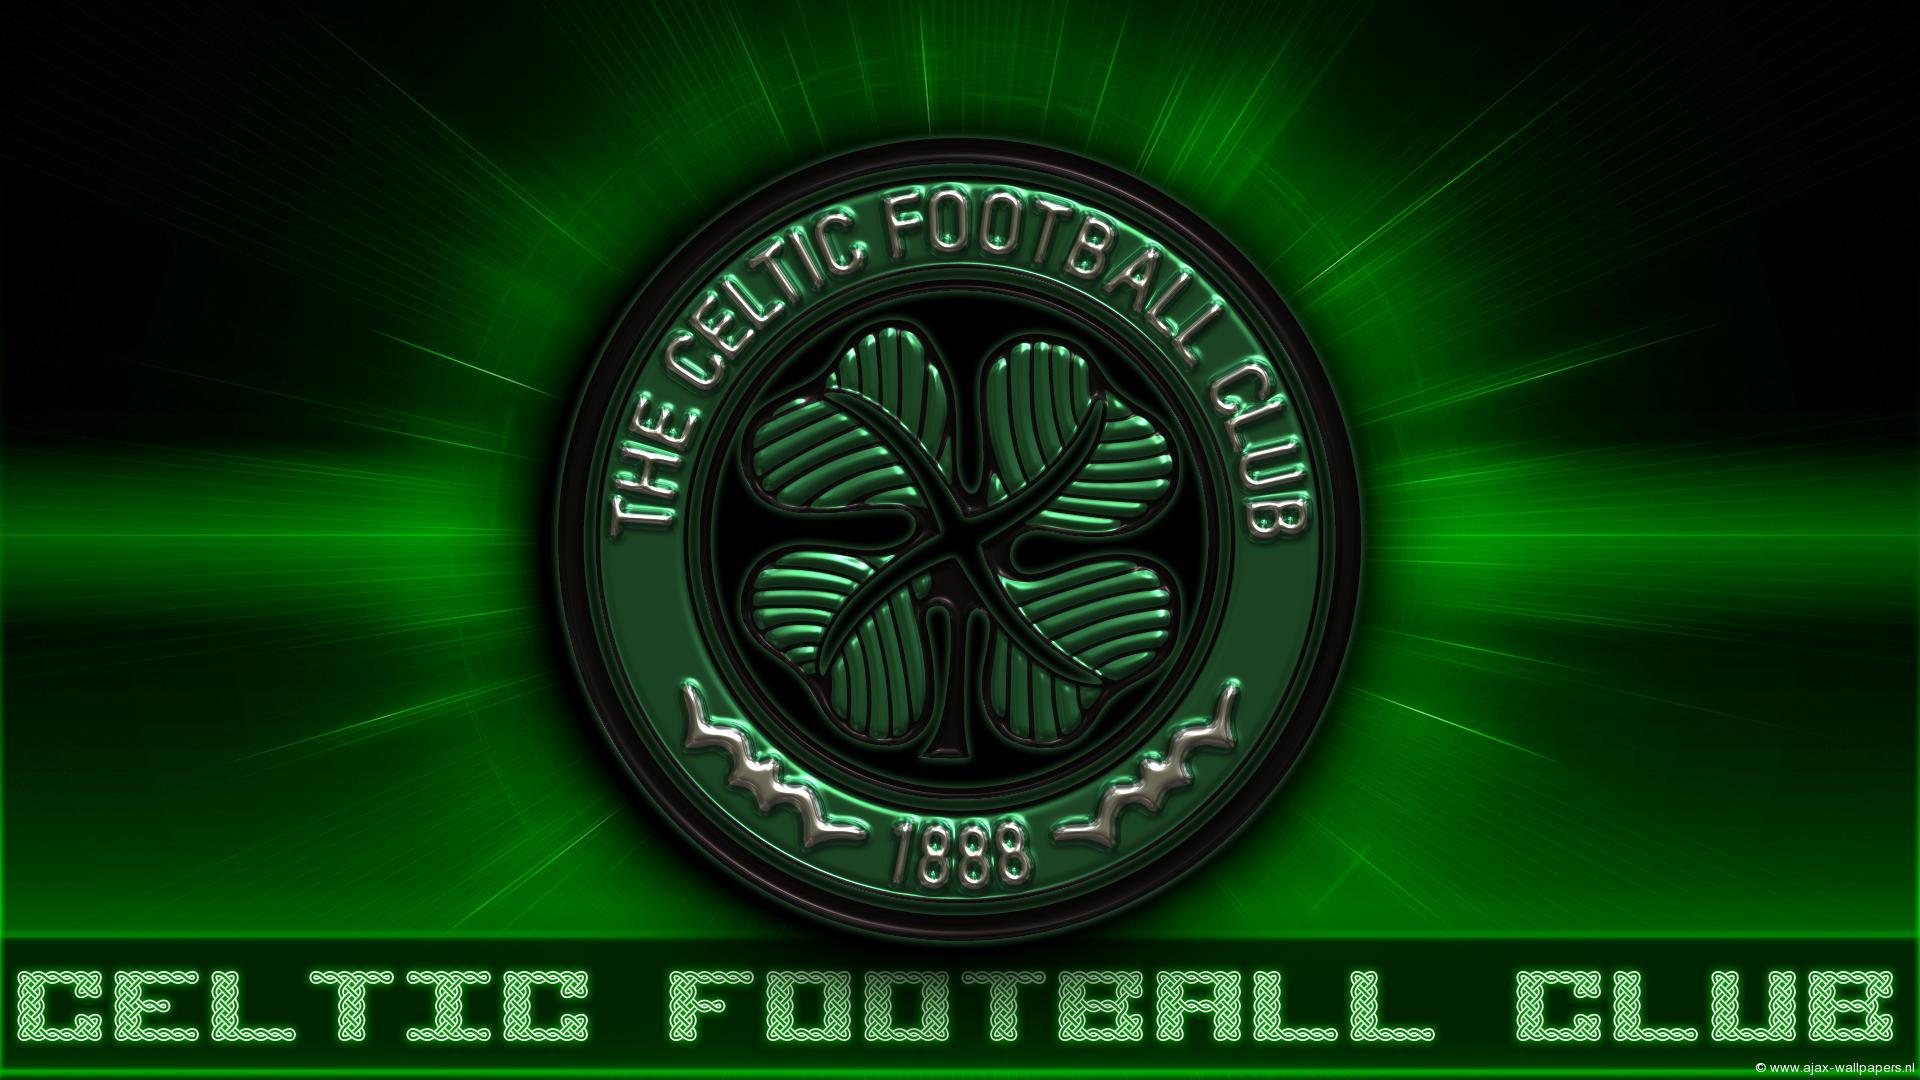 Celtic Fc Wallpaper 37347 Download HD Desktop Backgrounds and 1920x1080